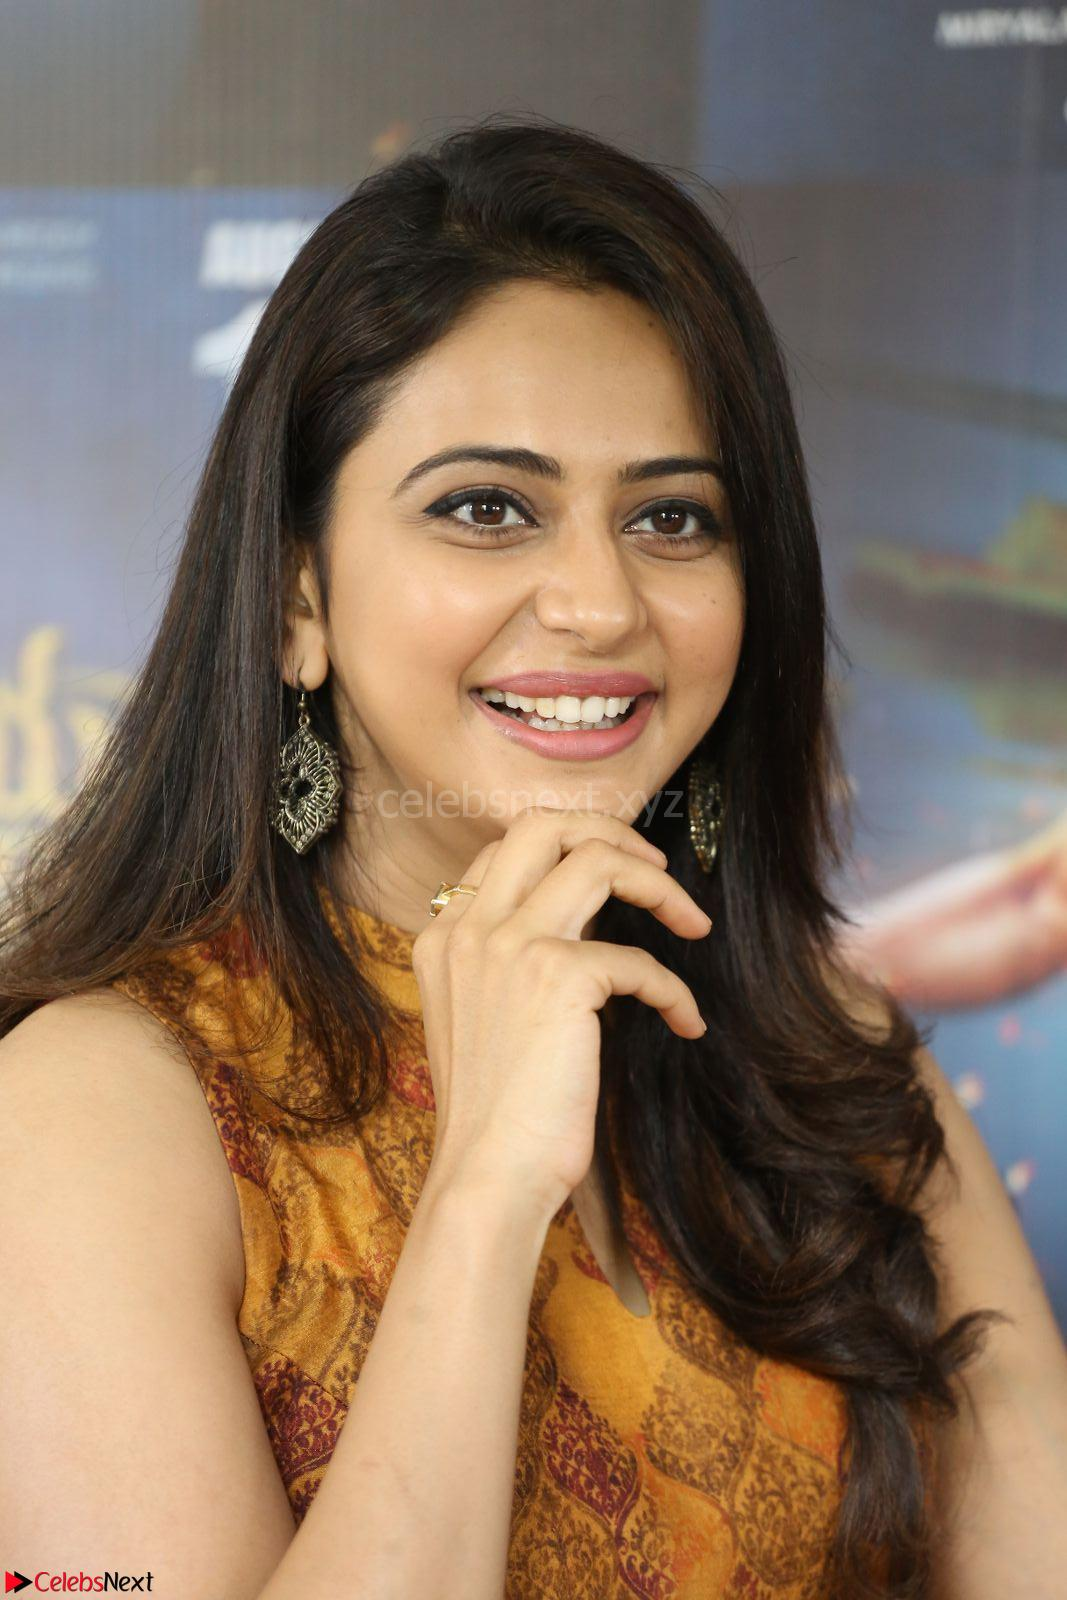 Rakul Preet Singh smiling Beautyin Brown Deep neck Sleeveless Gown at her interview 2.8.17 ~ CelebsNext Exclusive Celebrities Galleries